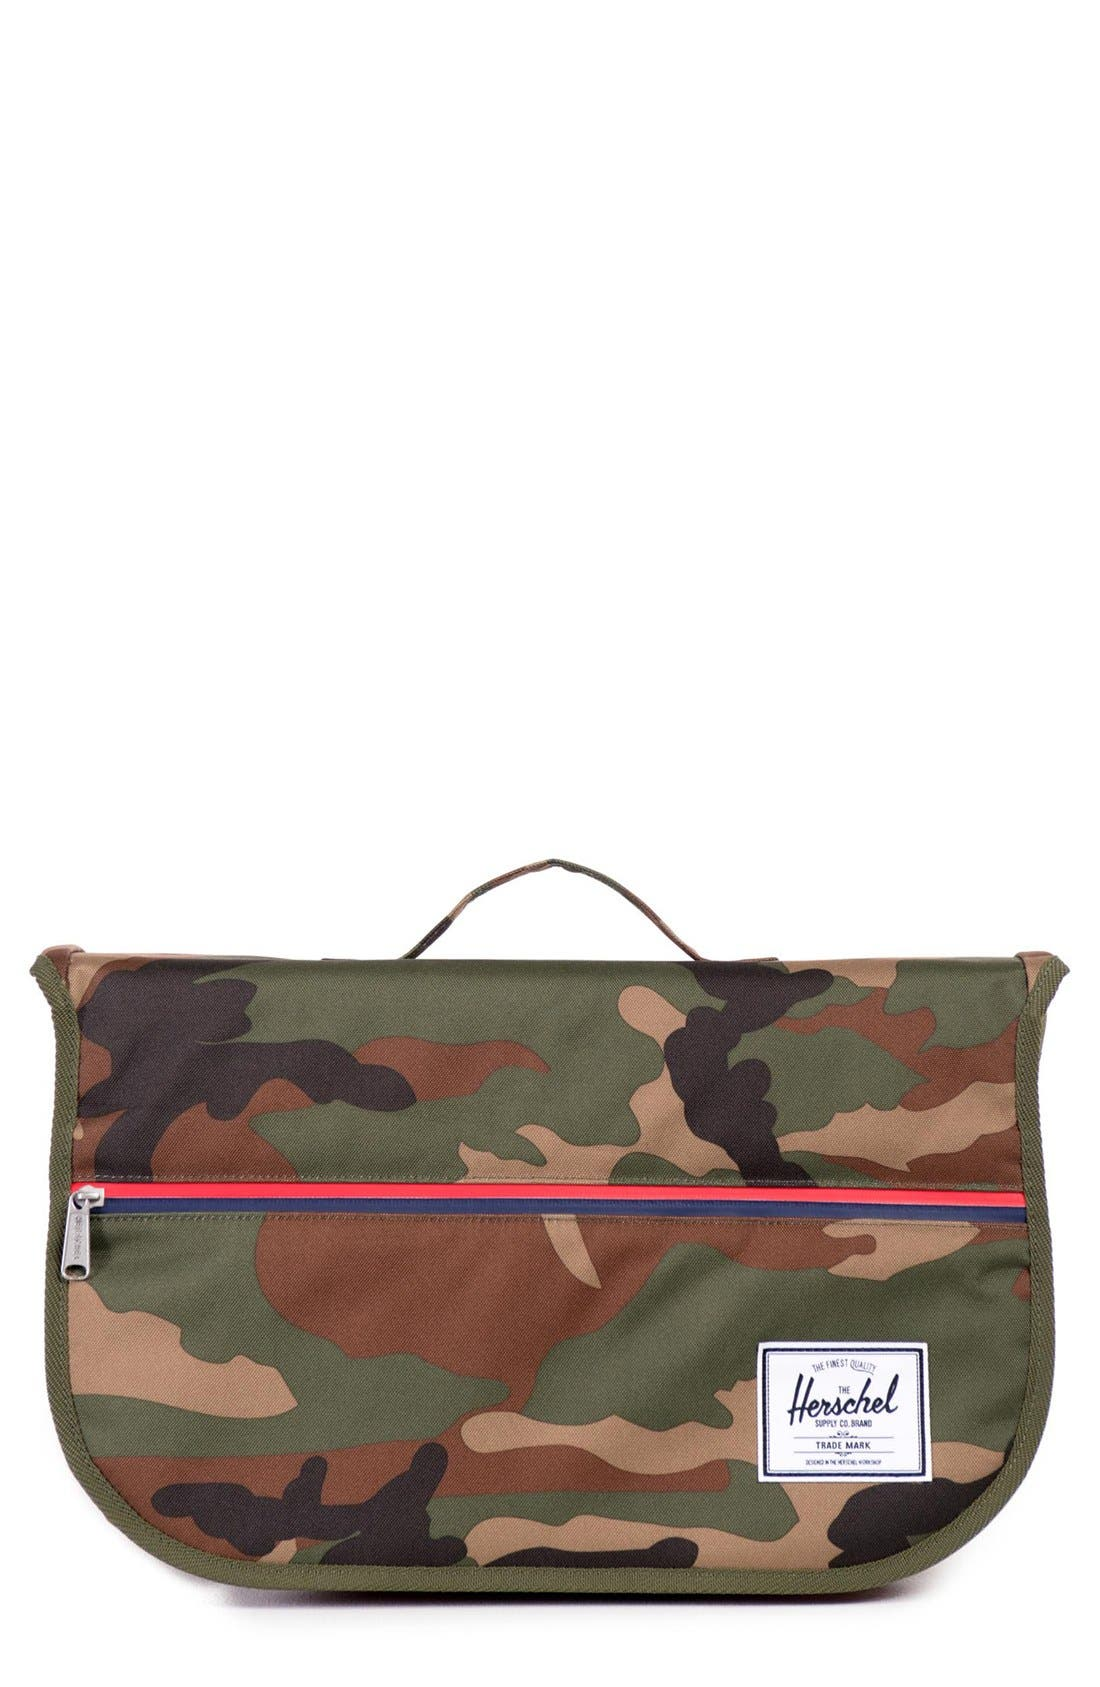 'Pop Quiz' Messenger Bag,                             Main thumbnail 1, color,                             Woodland Camo